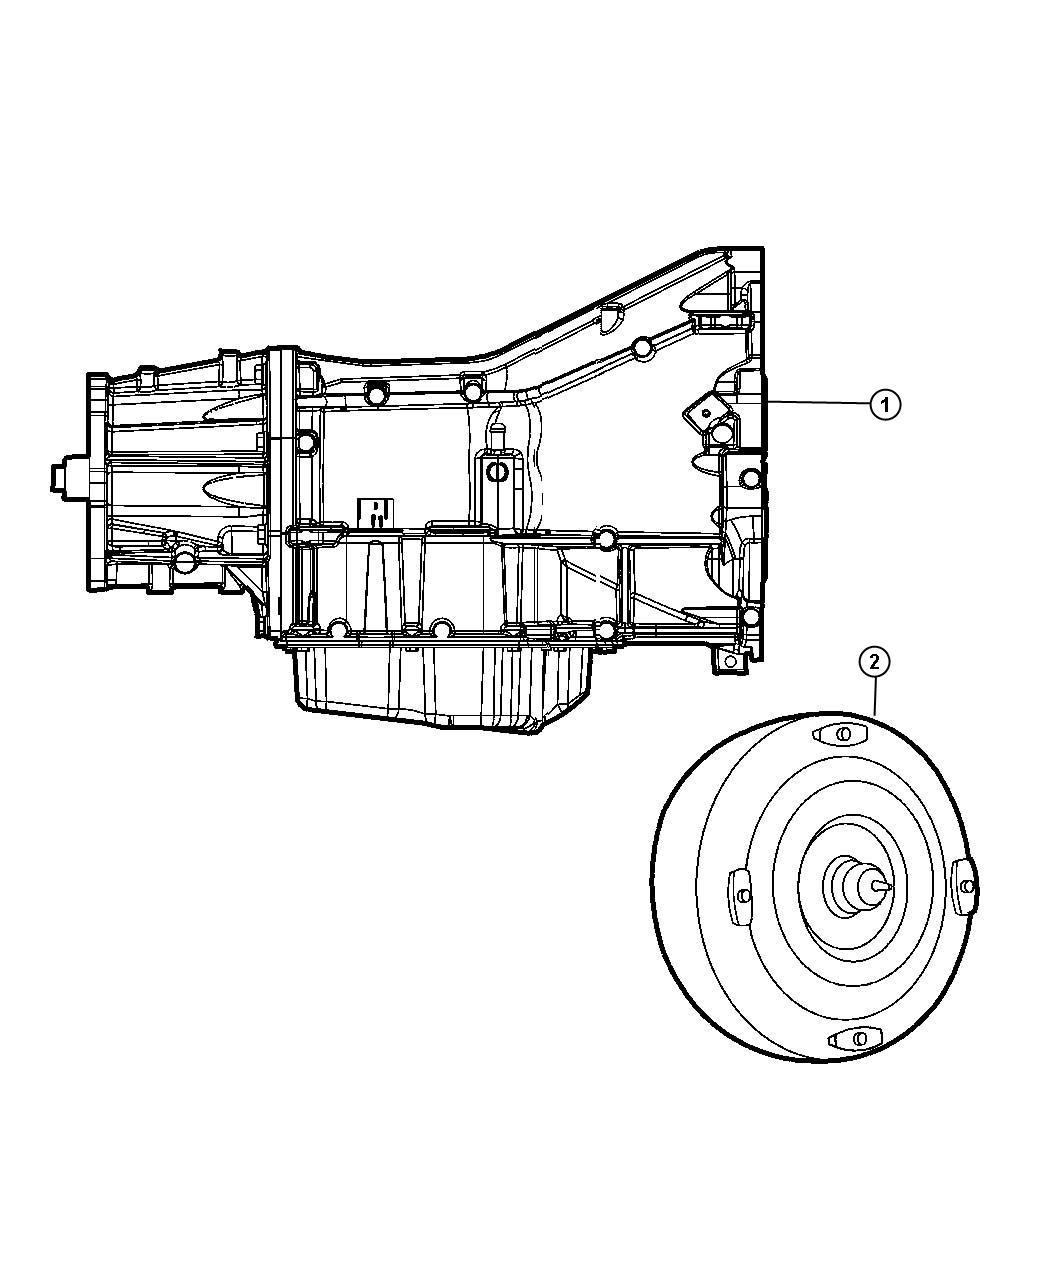 Jeep Wrangler Transmission Package